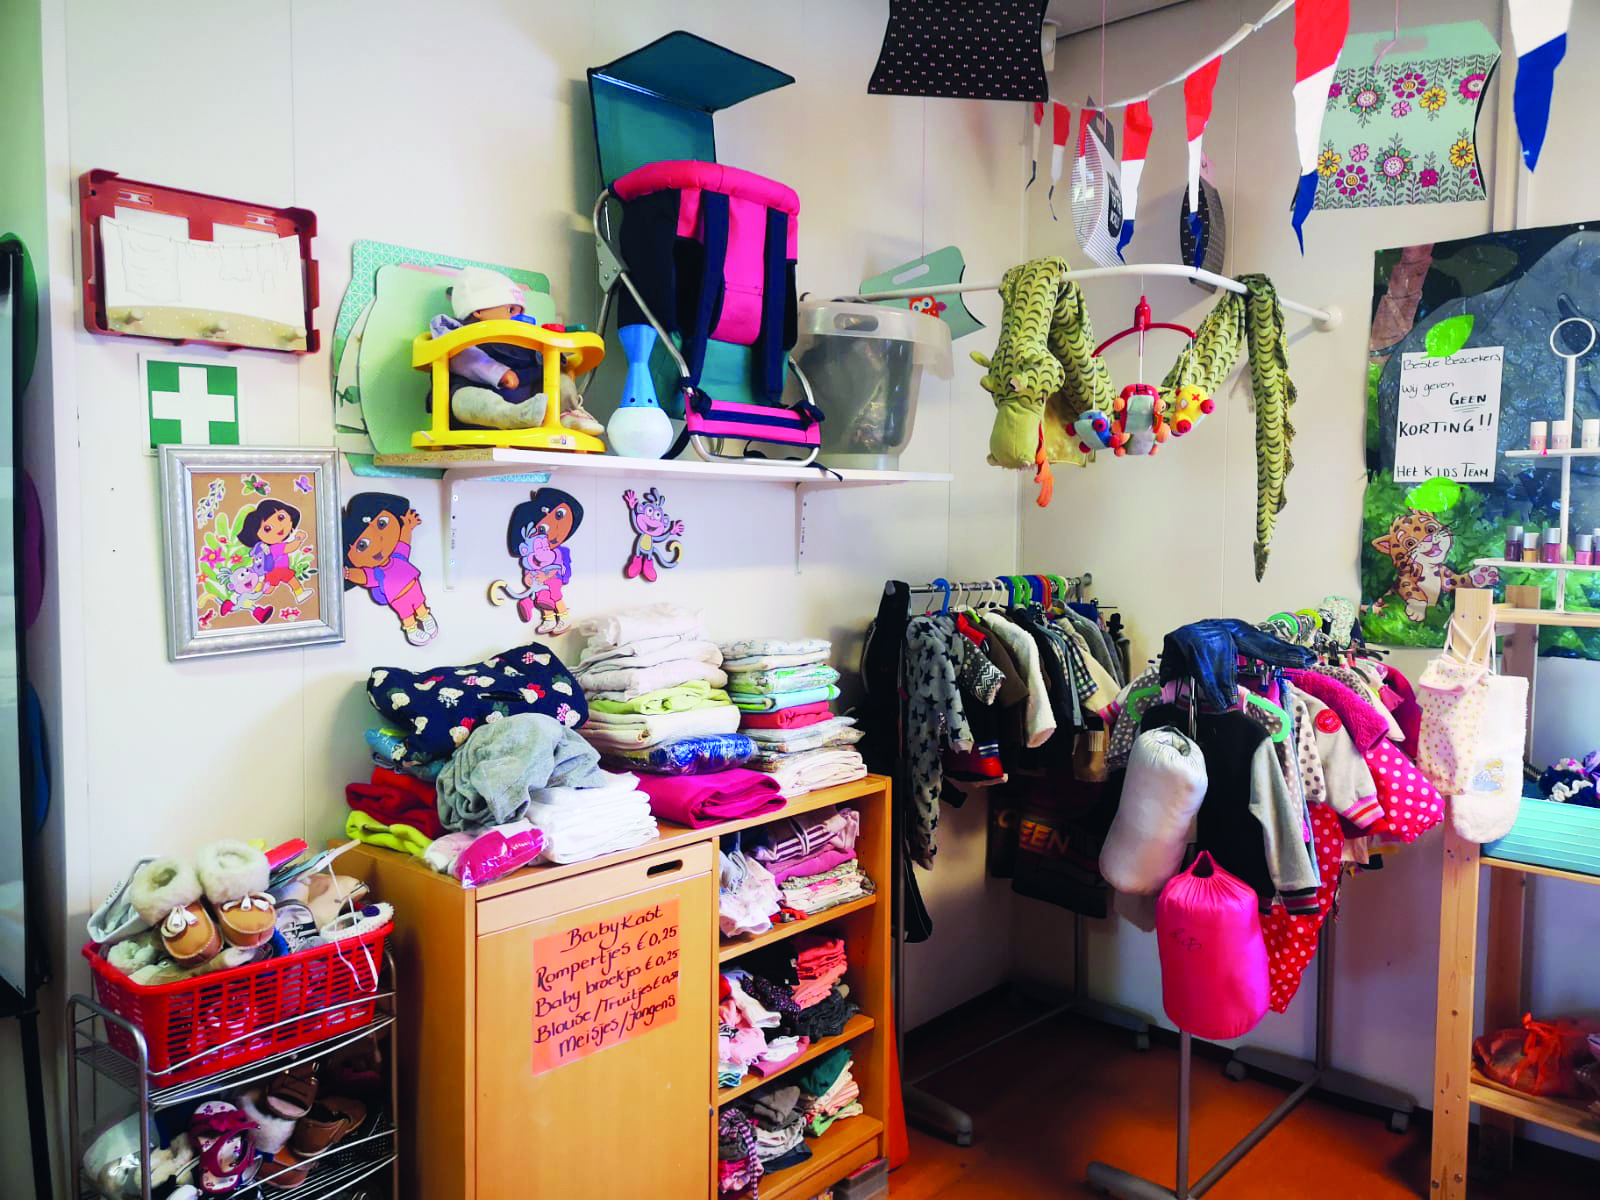 Kinderkleding Rotterdam.Opgroeien In Armoede In Rotterdam De Kanttekening